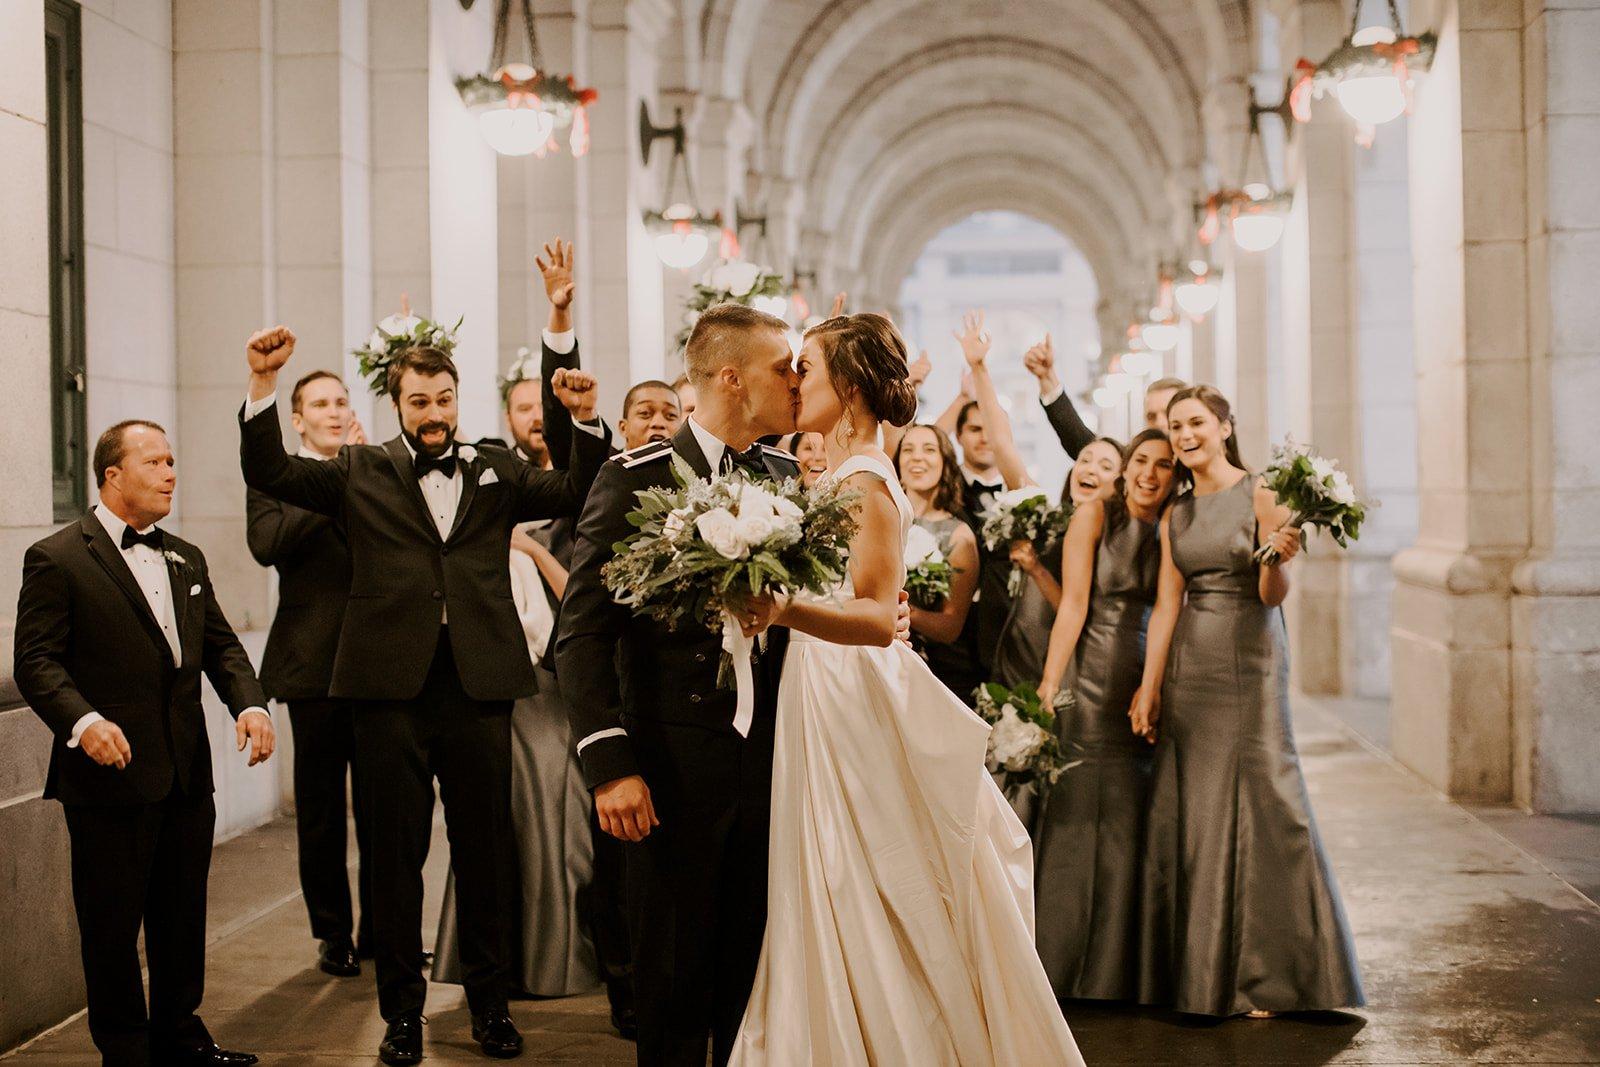 Madison + Jon Carkhuff Wedding // Washington, D.C.